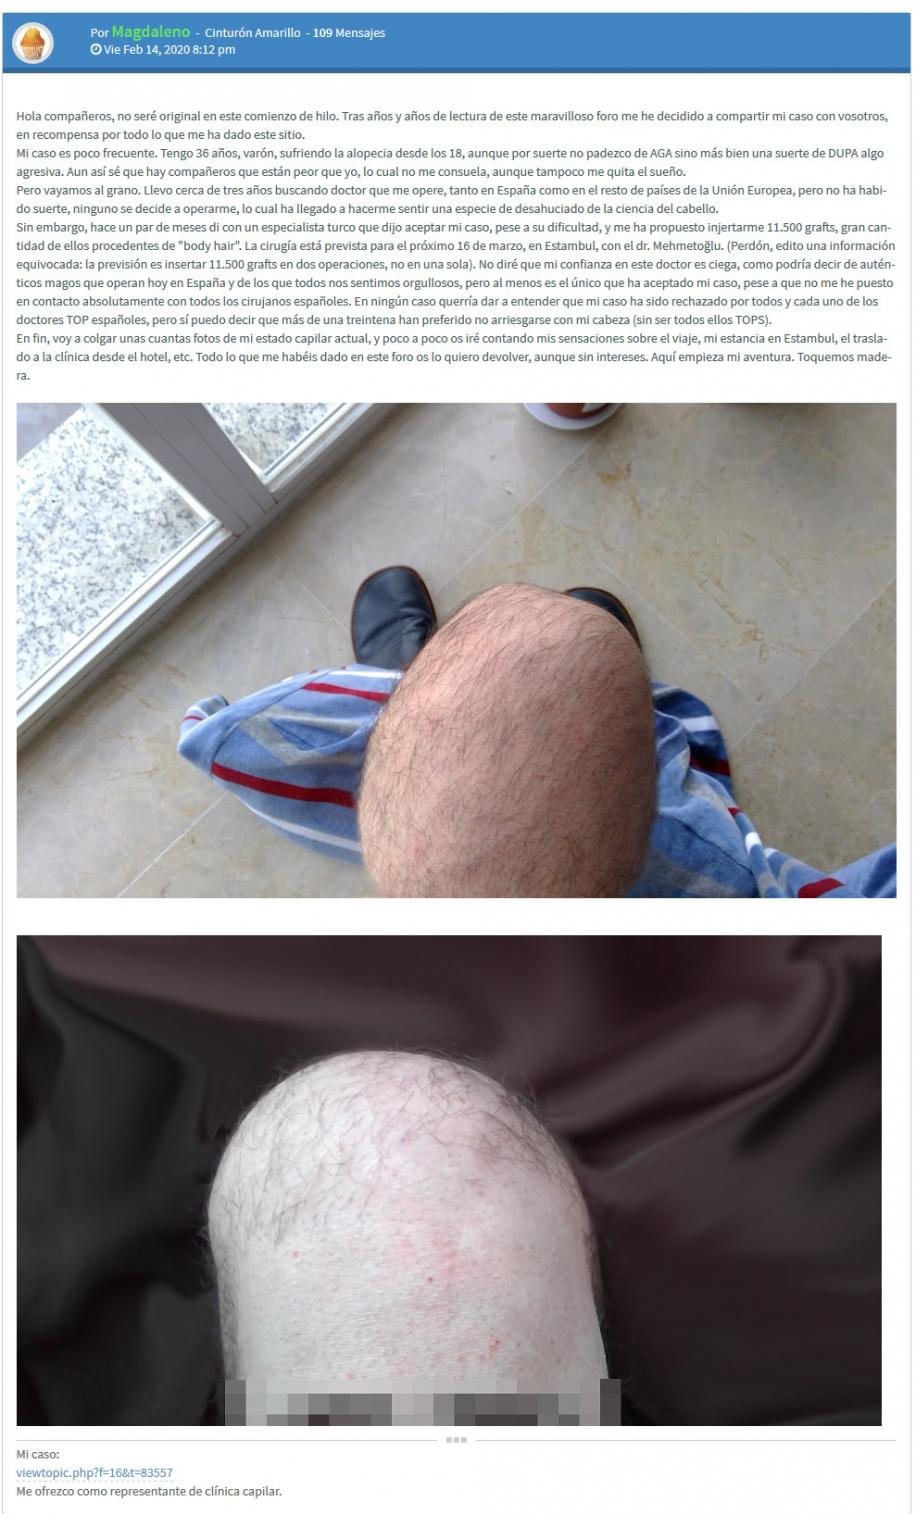 Engaña a un foro de alopecia con fotos de su rodilla